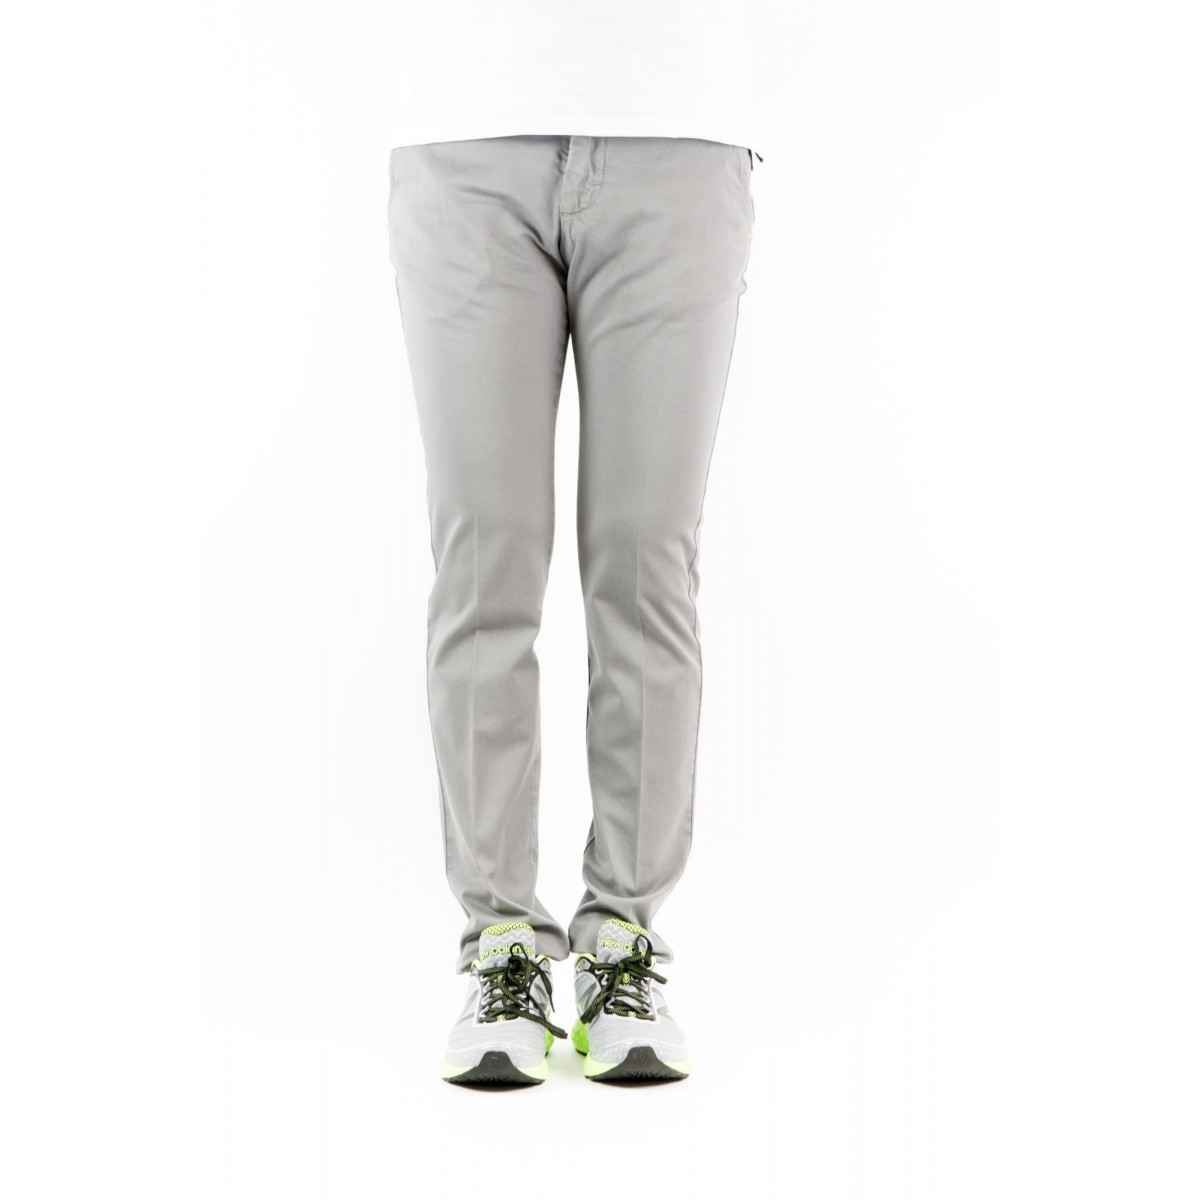 Trousers Entre Amis - 8201 292L17 Gabardina Strech 0303 - grigio